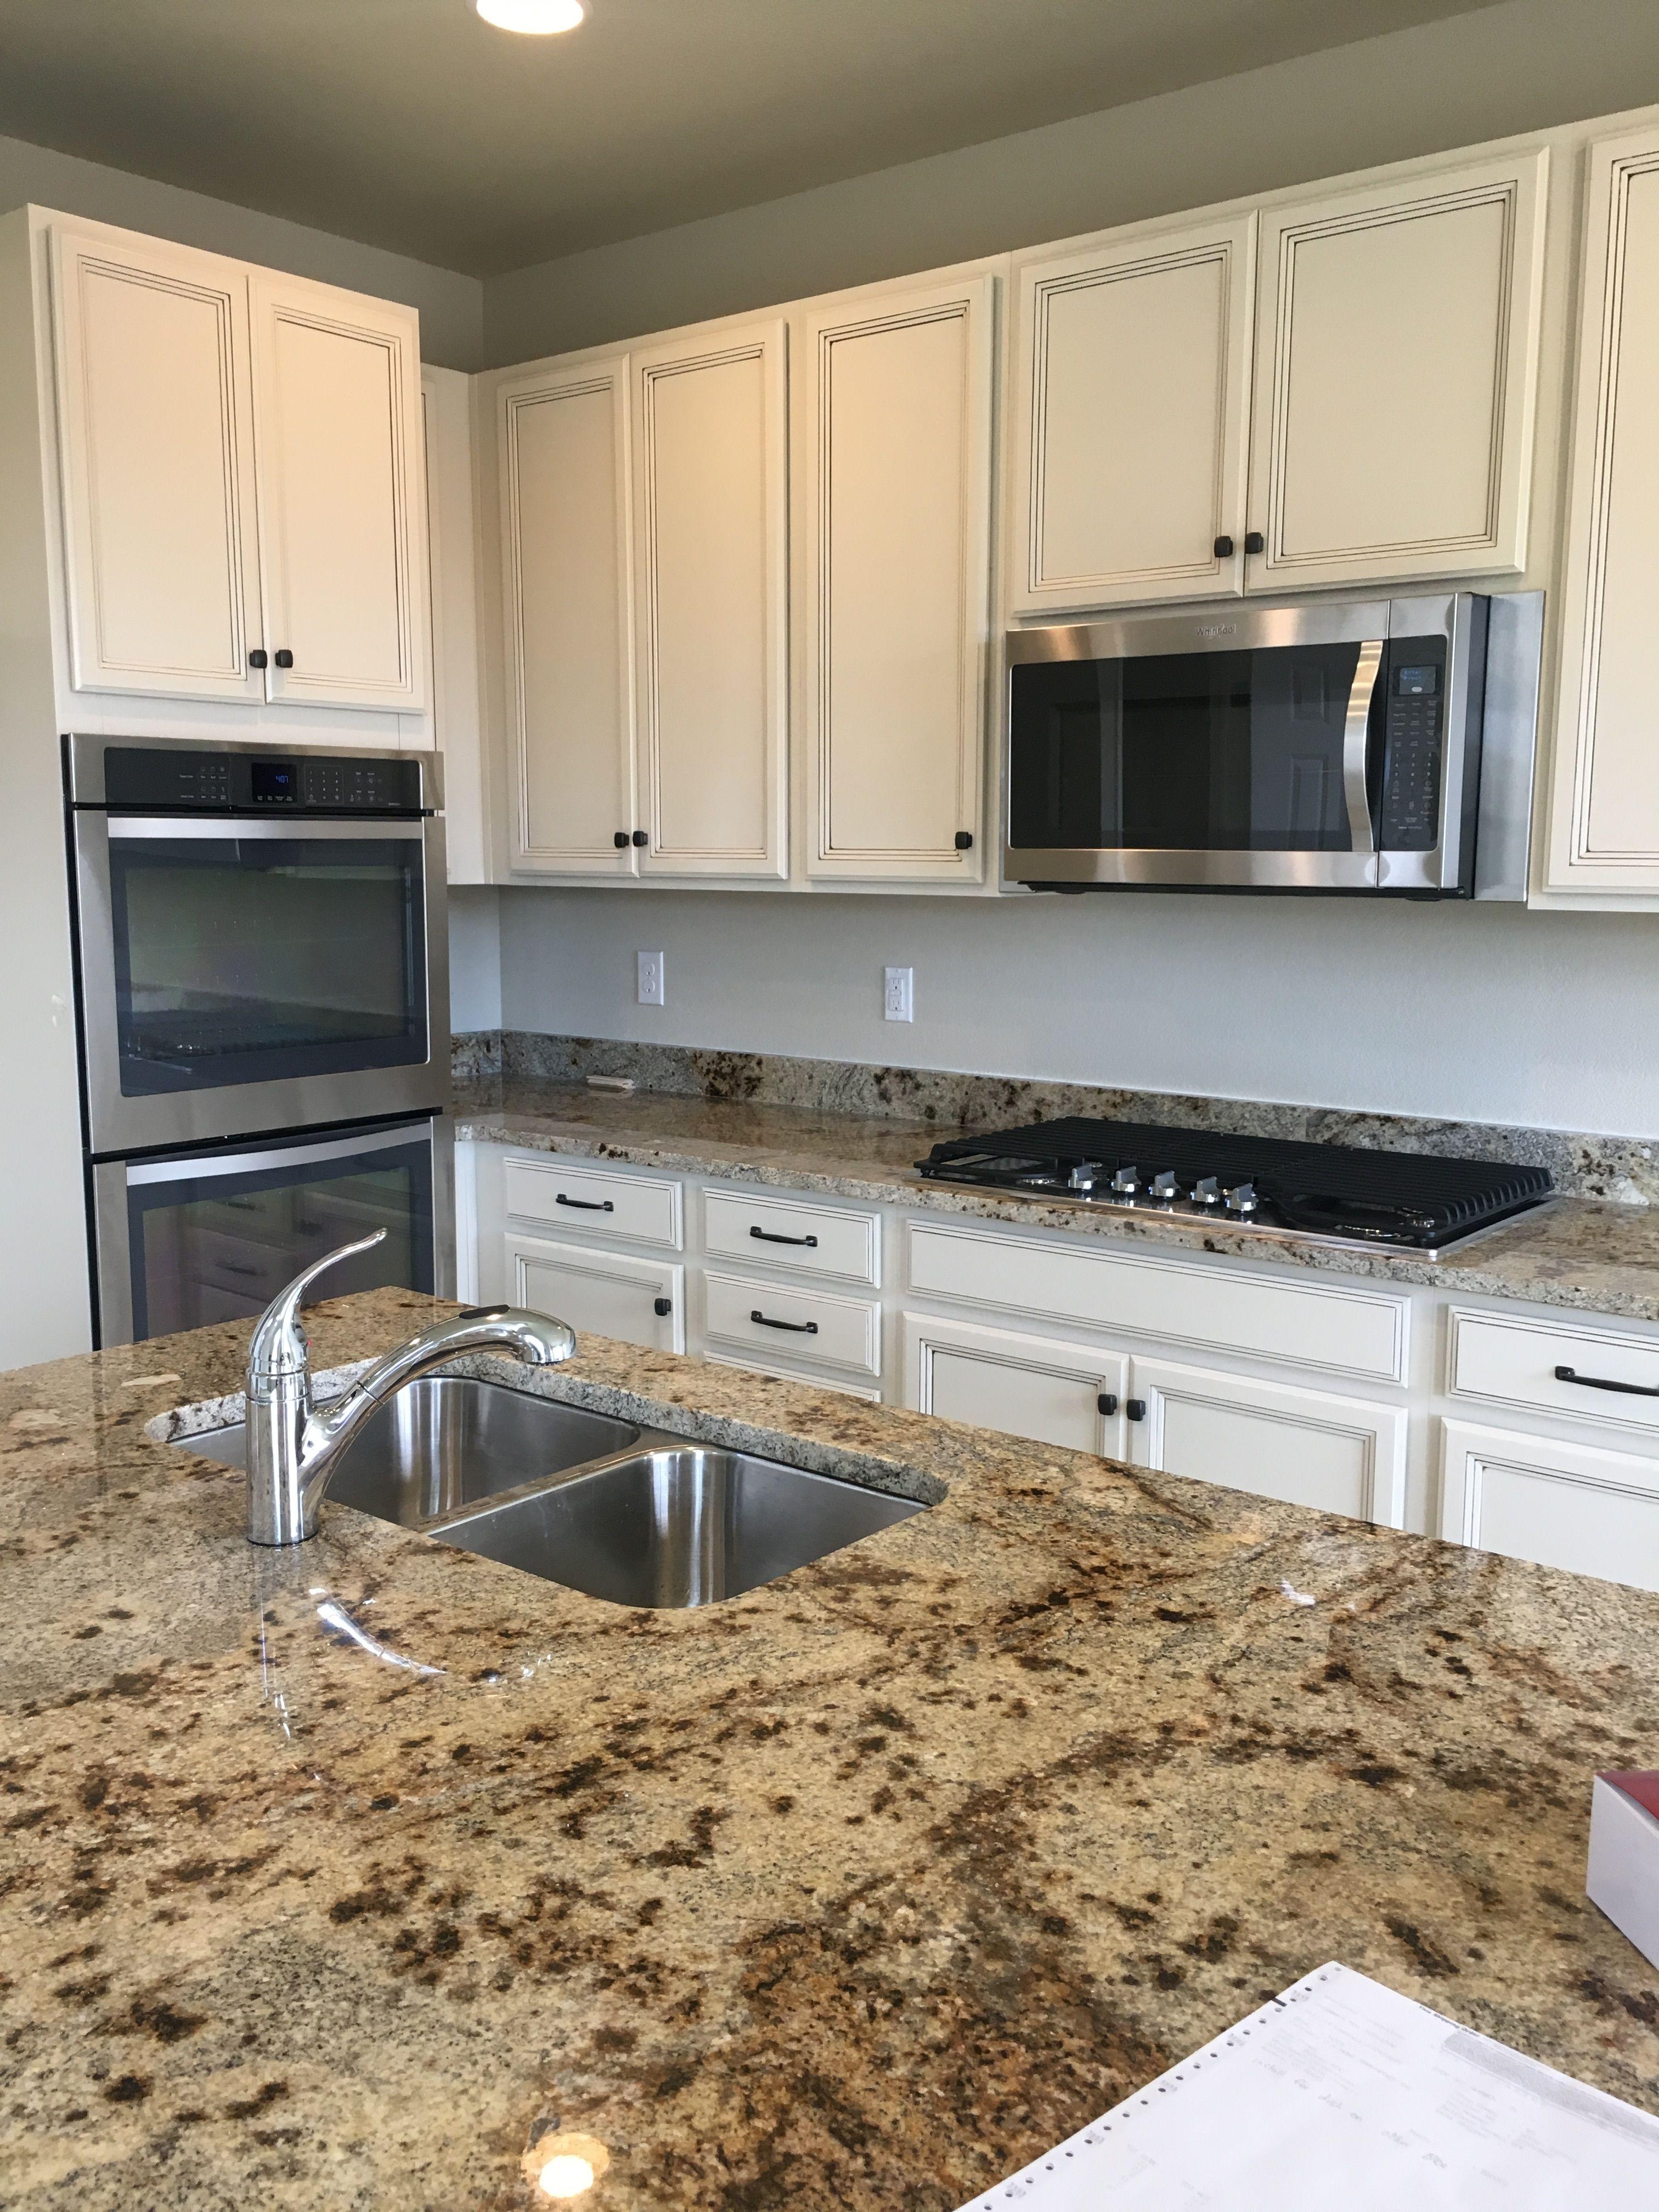 cobra granite our remodel kitchen remodel kitchen cabinets kitchen rh pinterest com